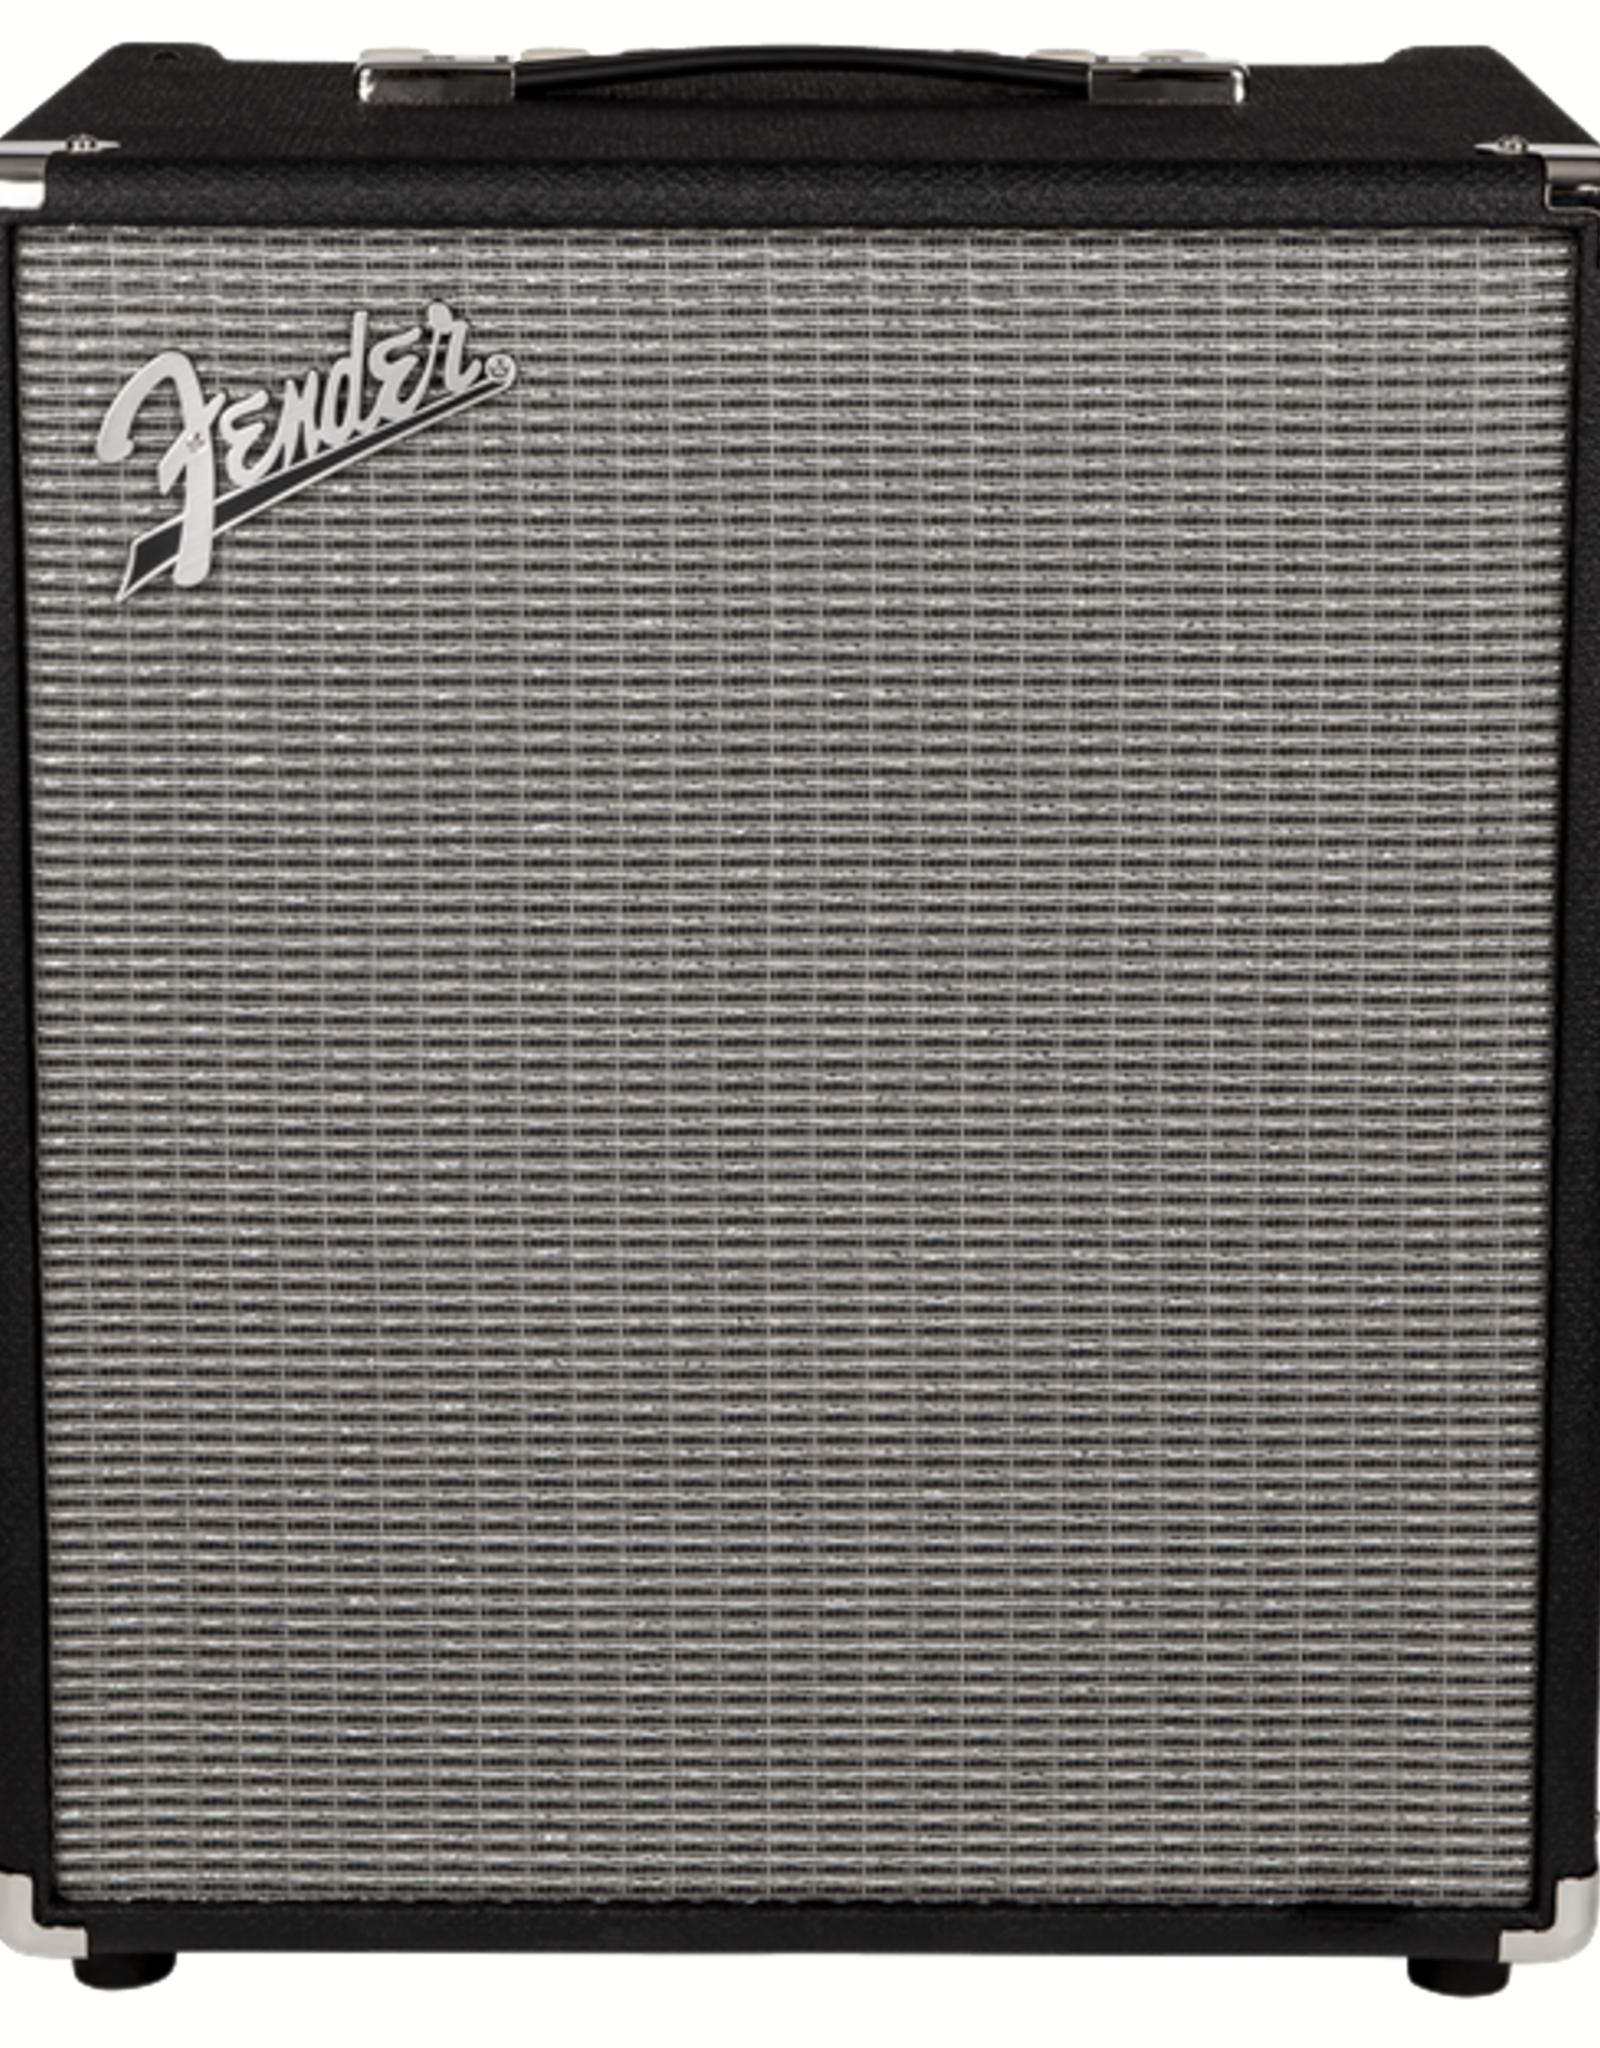 Fender Fender Rumble 100 V3, 120V, Black/Silver